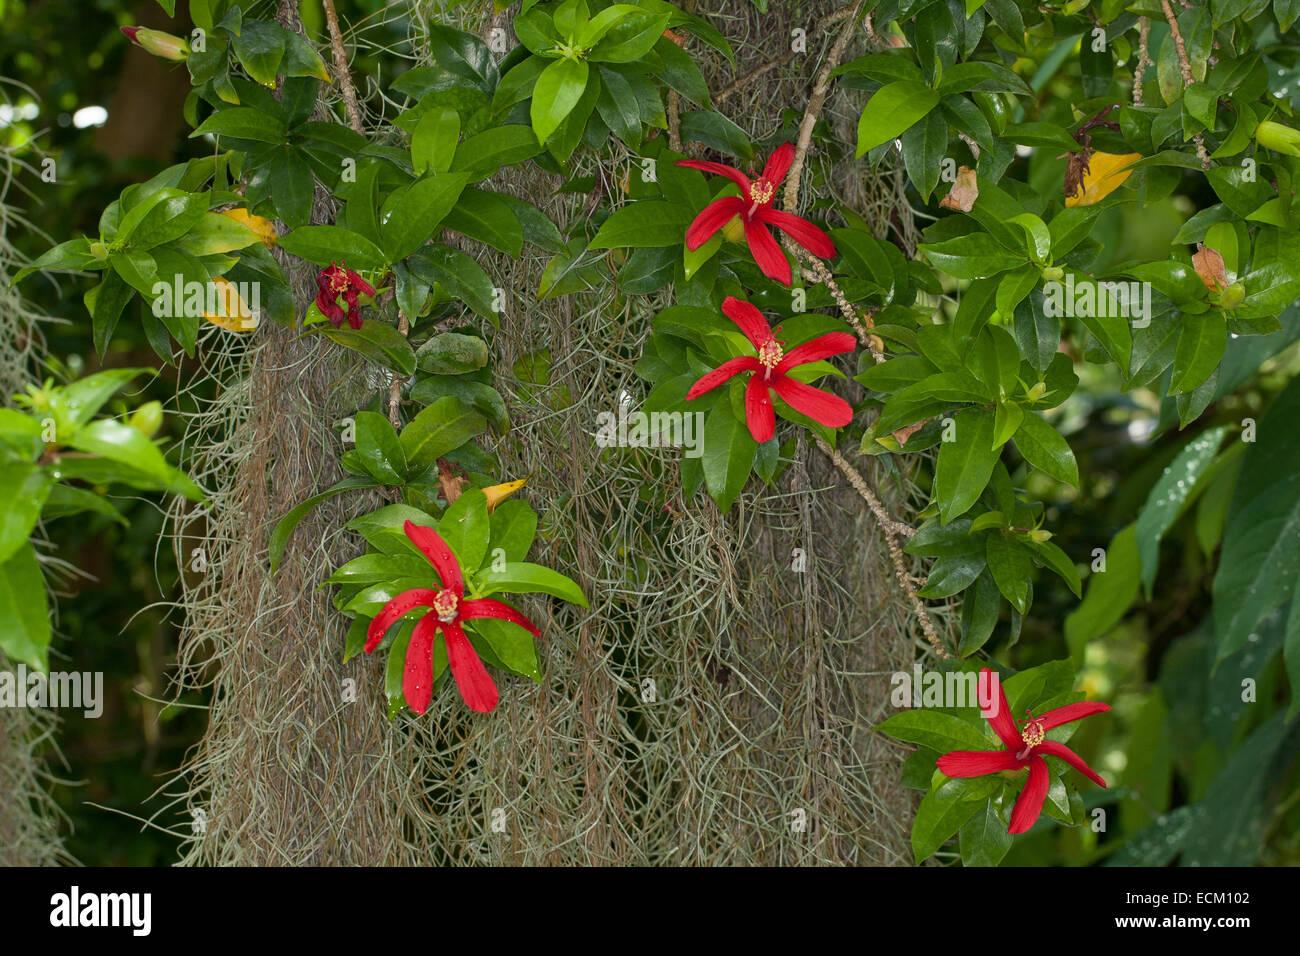 Hawaiian rote Hibiskus, Hawaii Hibiskus, Hibiskus, Riesen Malve, Eibisch, Hibiscus Clayi, Hibiskus, Eibisch, Roseneibisch Stockbild